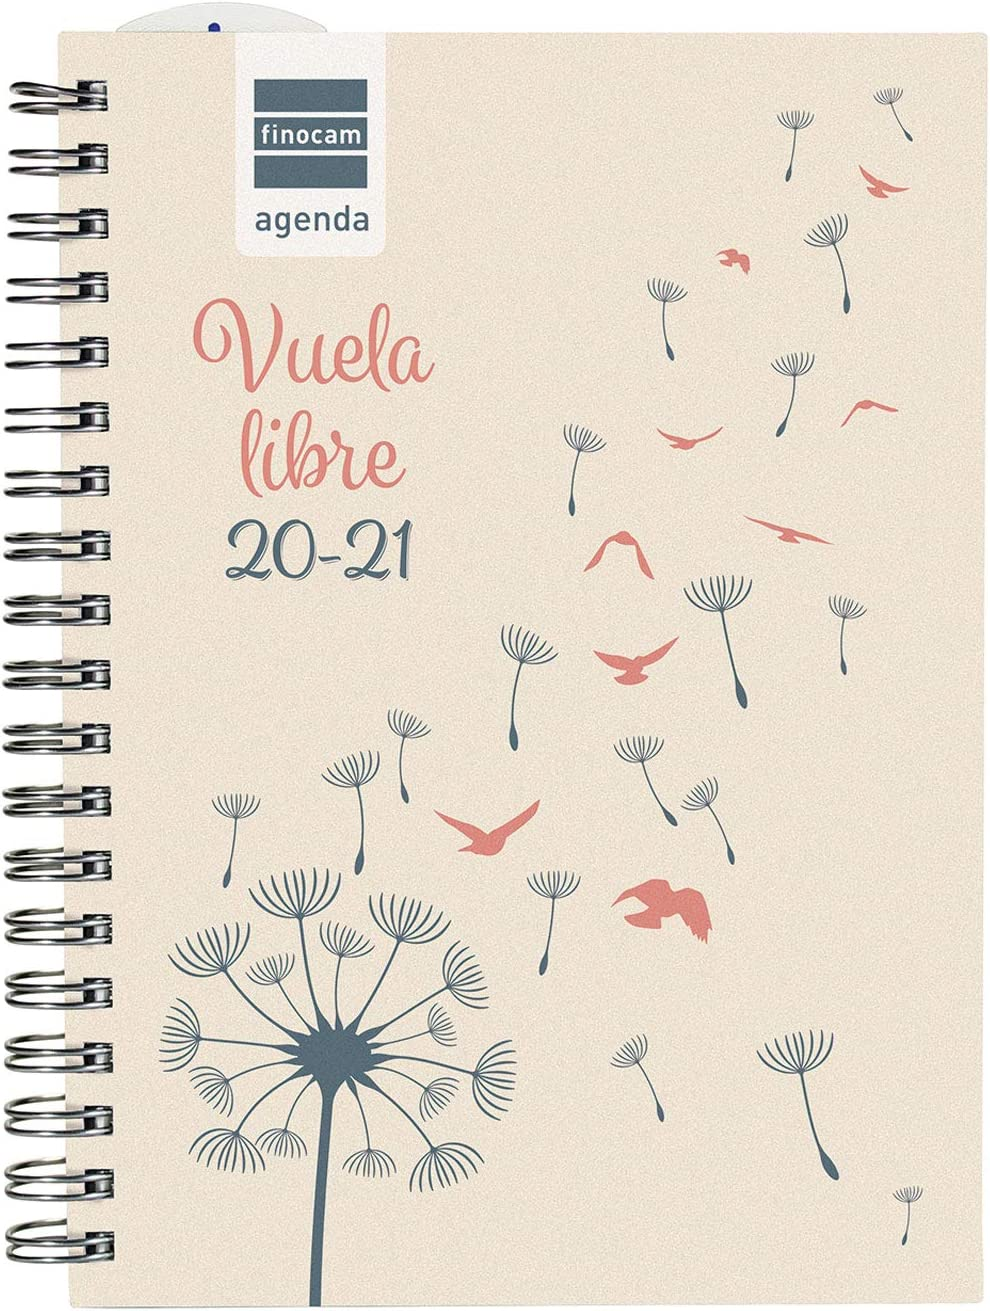 Finocam - Agenda Curso 2020-2021 para Secundaria Octavo, 120 x 169, Semana Vista Apaisada Mini Institut Vuela, Español